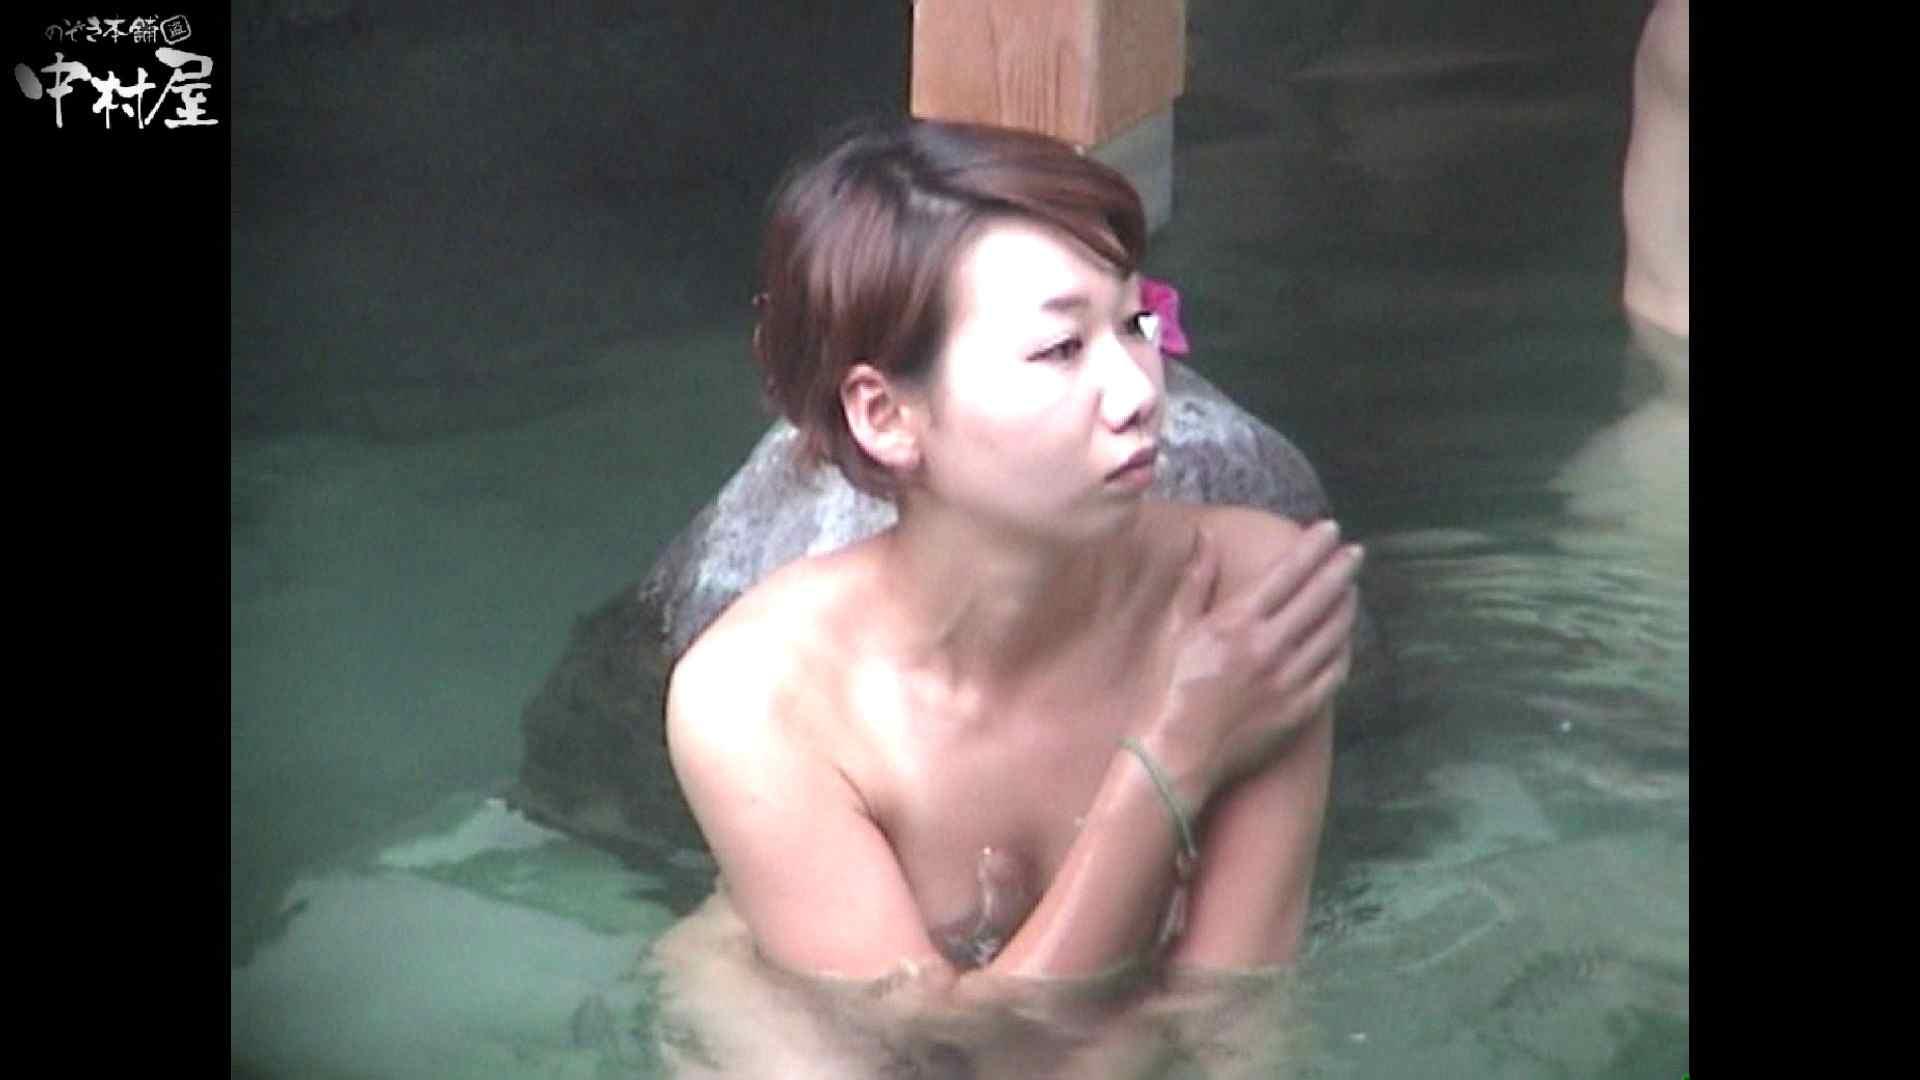 Aquaな露天風呂Vol.951 盗撮師作品 | 露天風呂突入  96pic 10